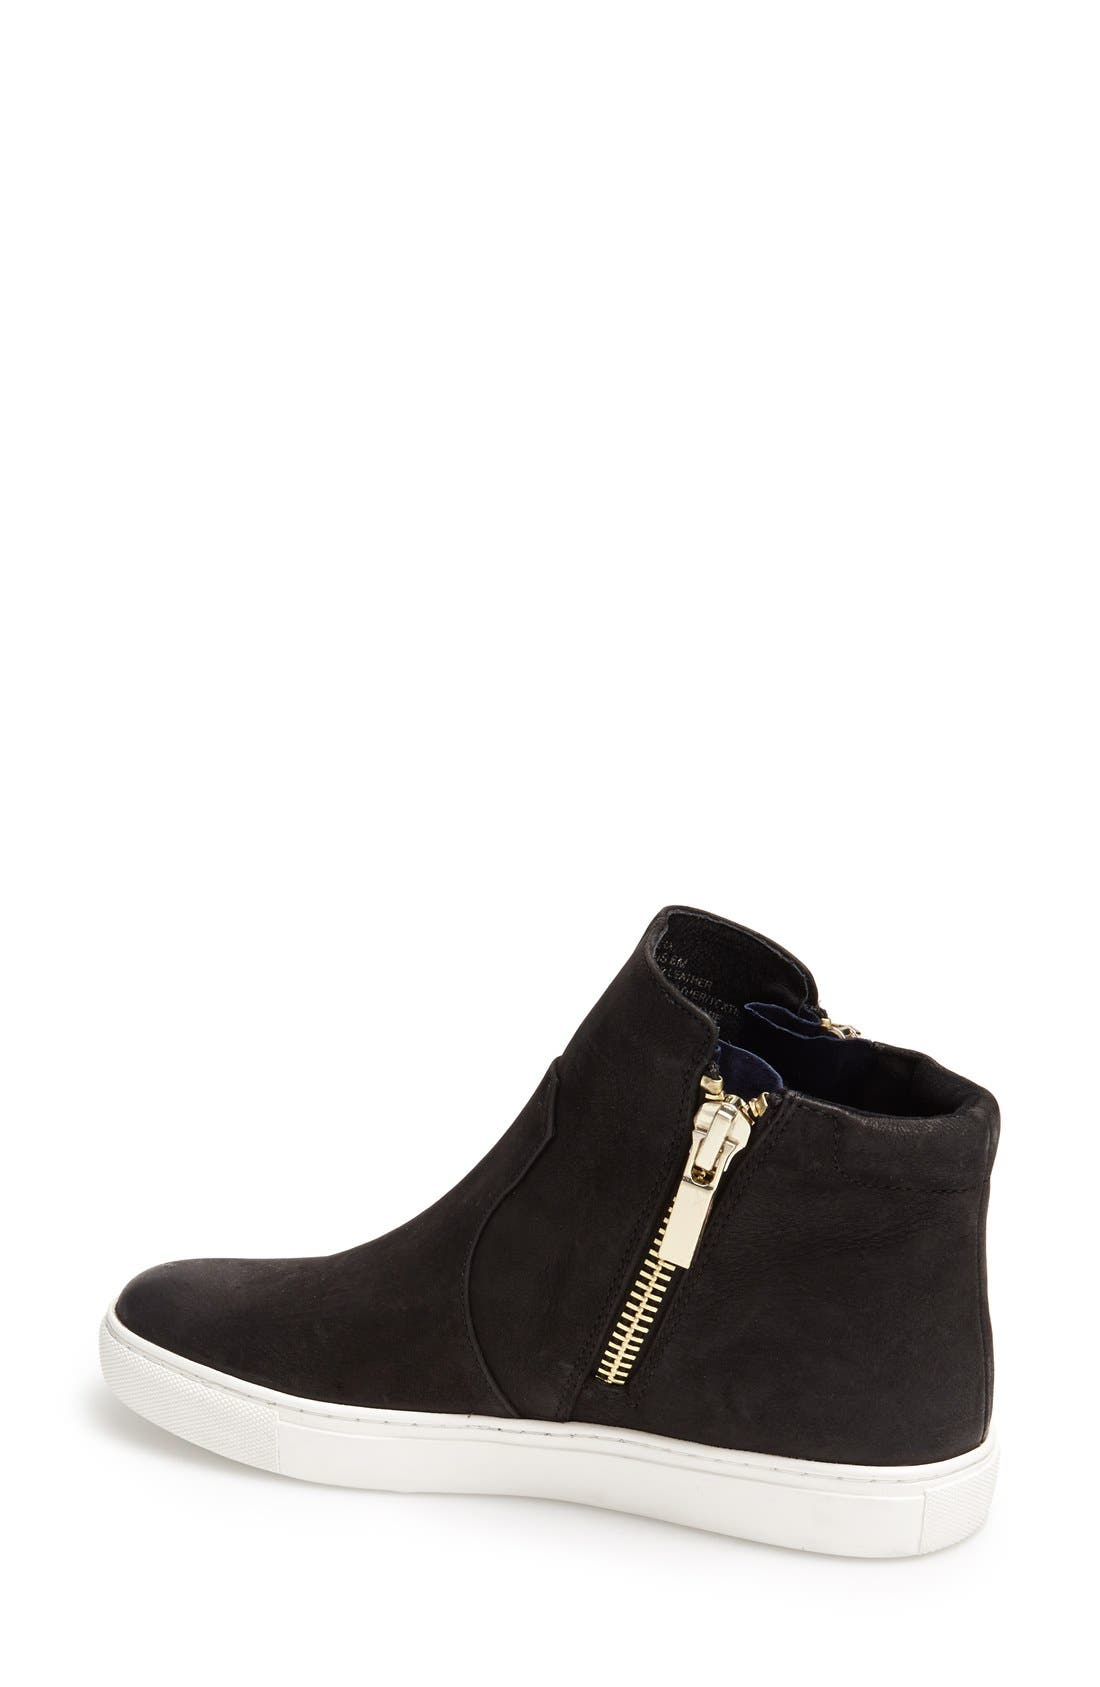 'Kiera' Zip High Top Sneaker,                             Alternate thumbnail 3, color,                             BLACK LEATHER